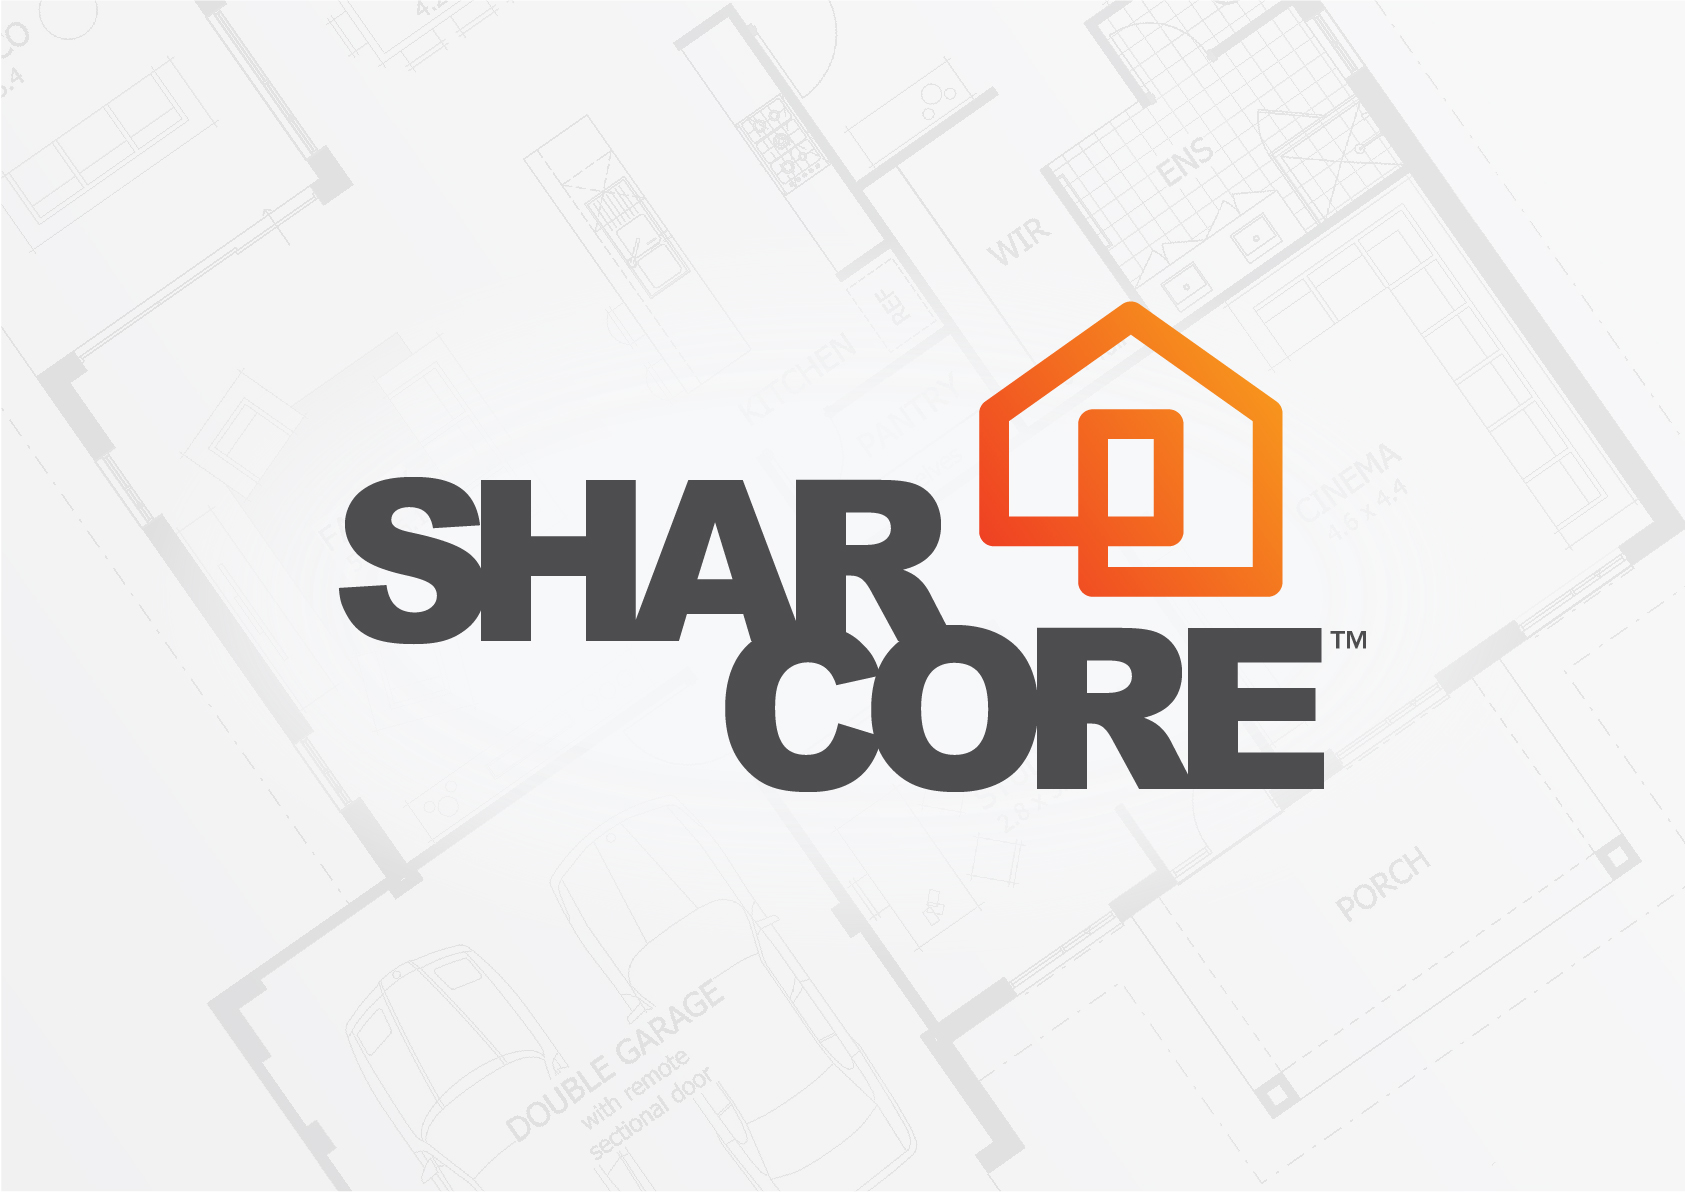 Sharcore - Artboard 17.jpg